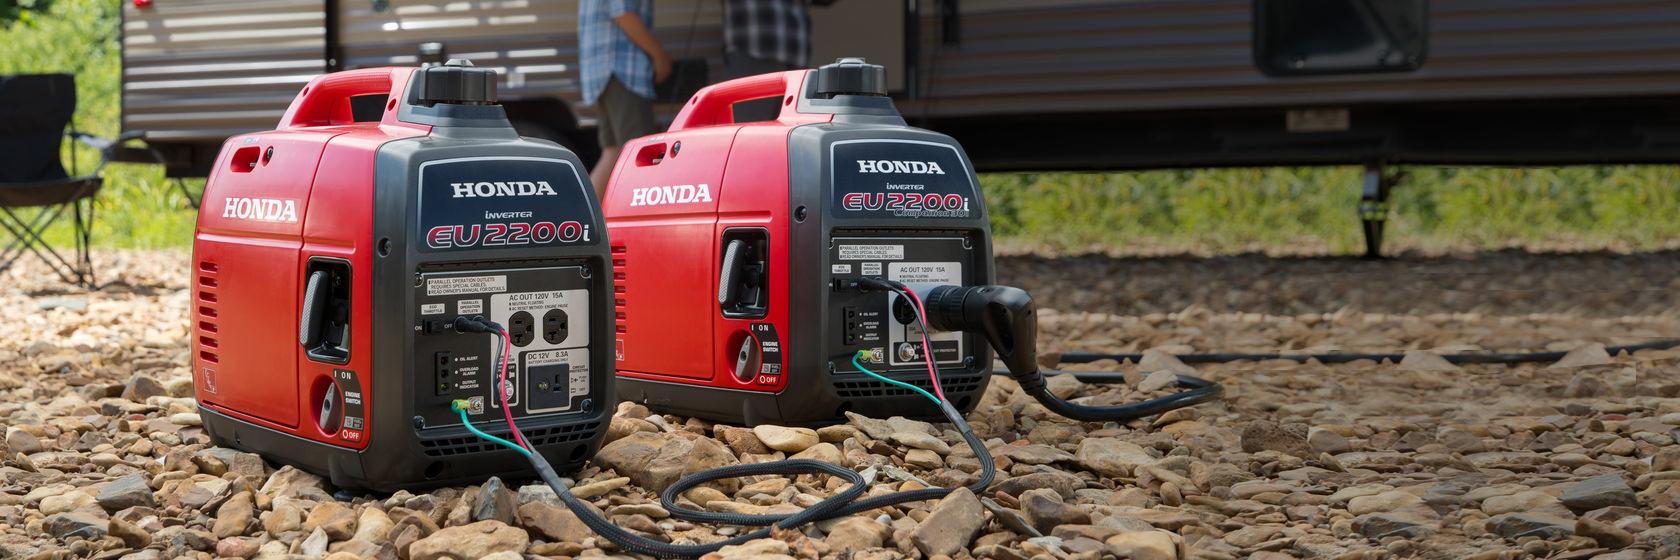 Honda Generators, Portable Honda Generators For Sale